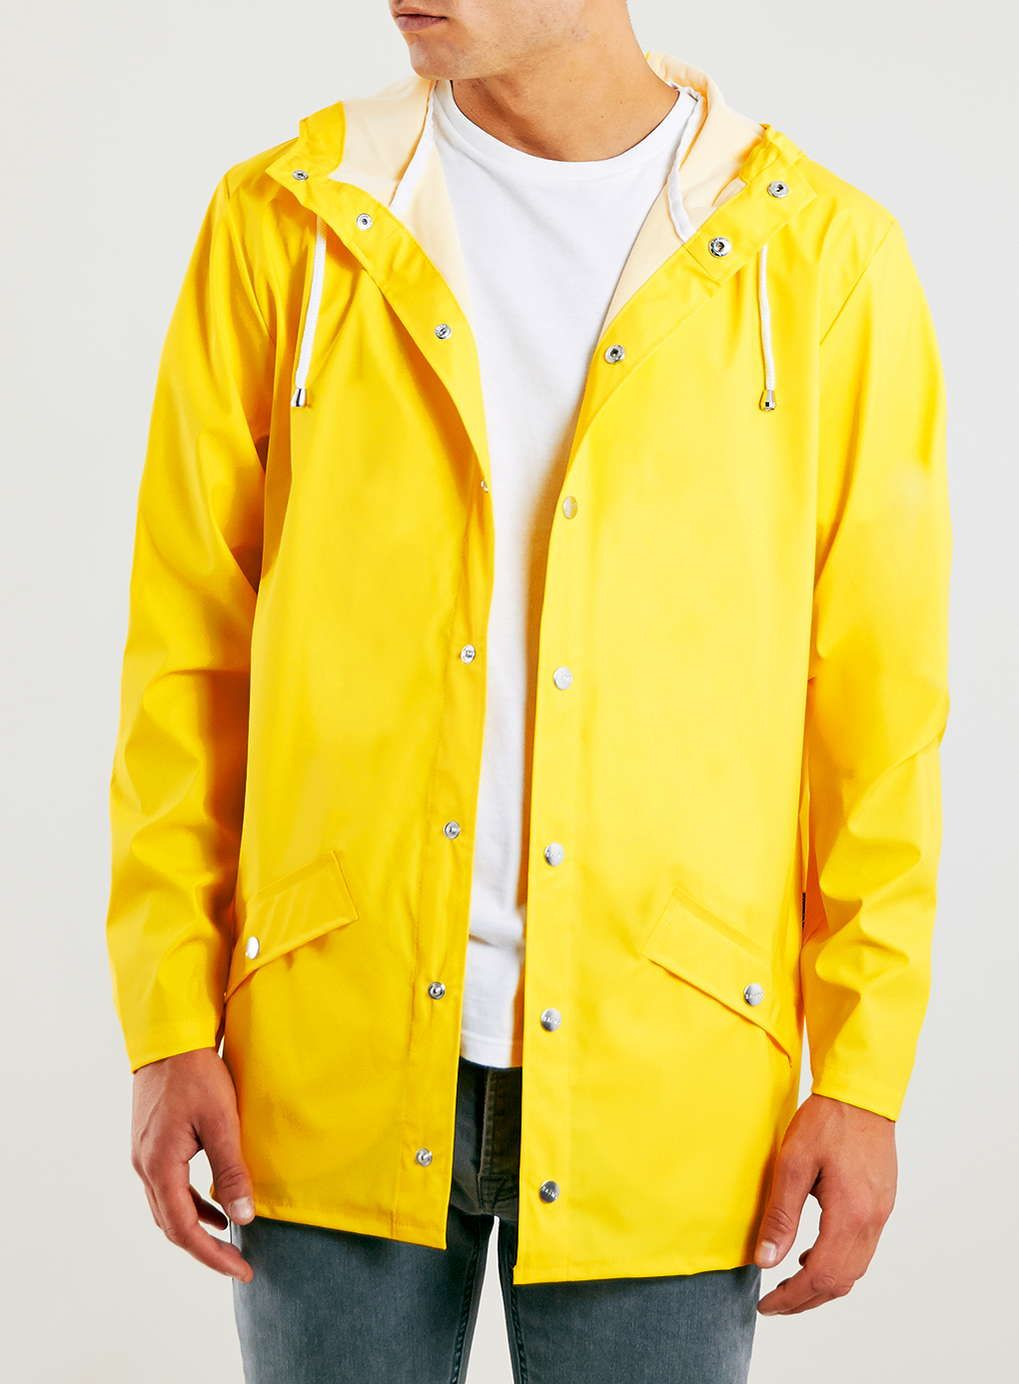 ca53bd60 Rains Yellow Short Jacket | style | Yellow rain jacket, Yellow ...